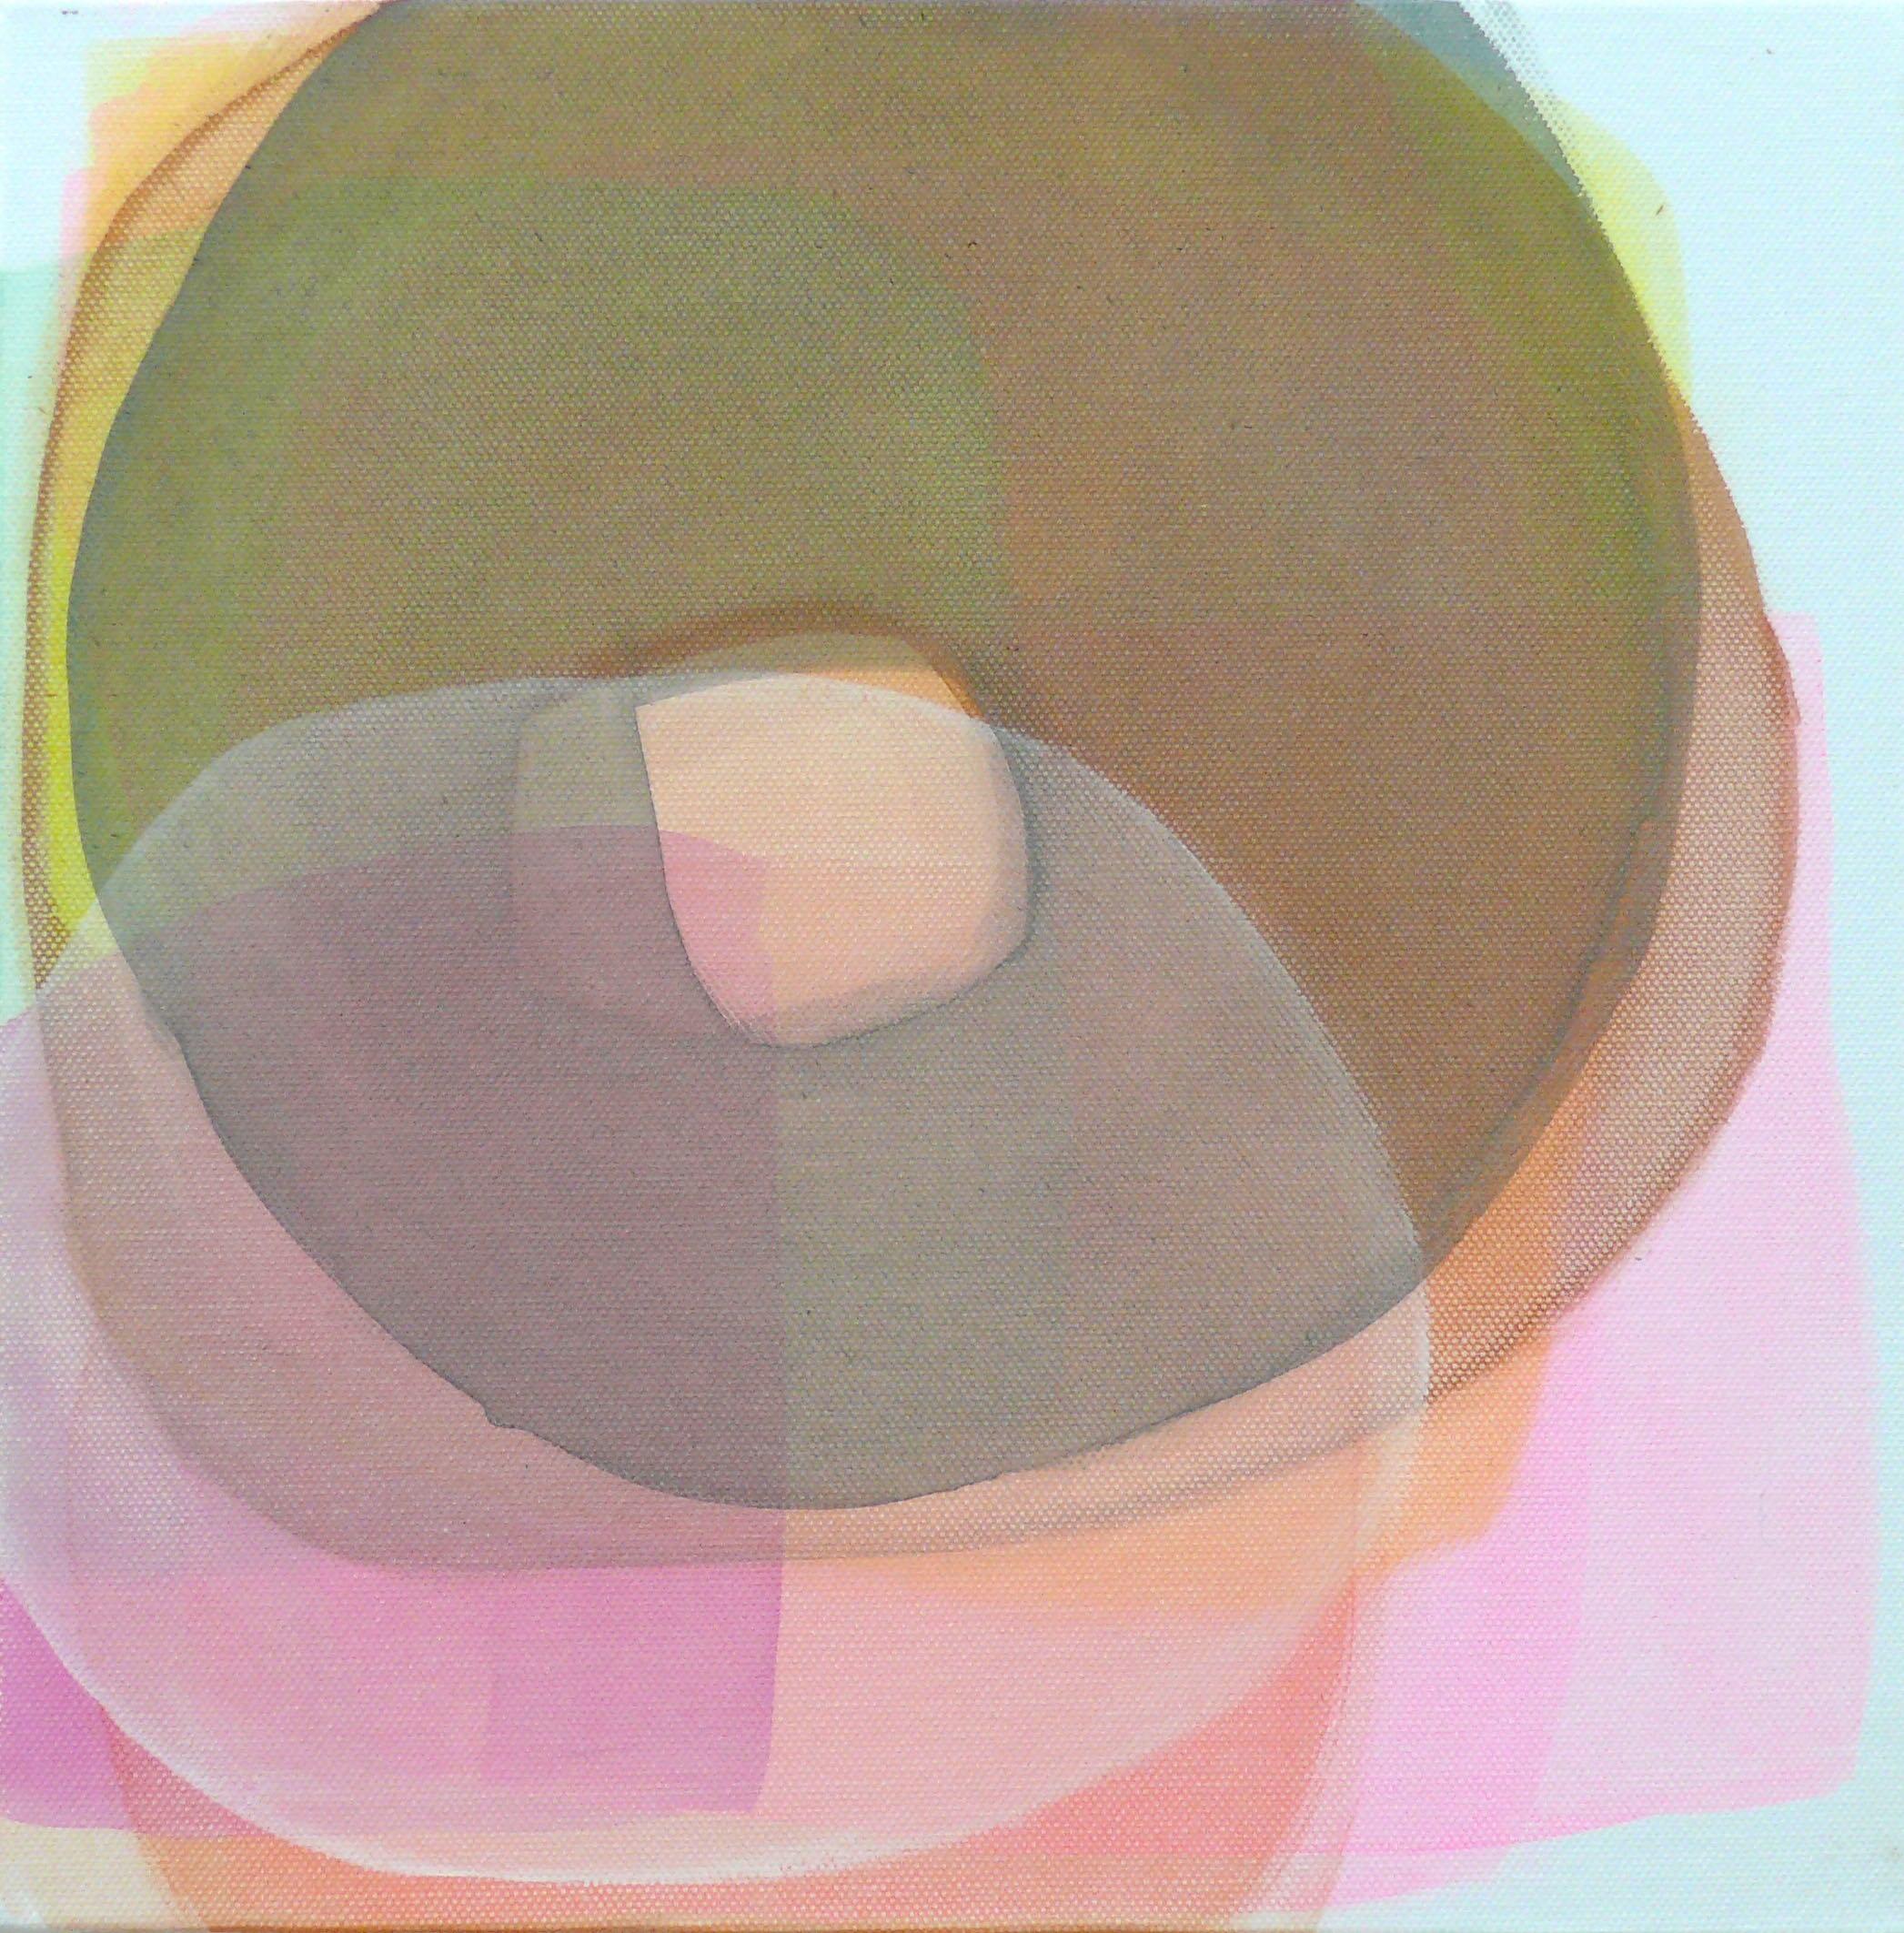 o.T. 2018 Acryl auf Leinwand 30x30 cm